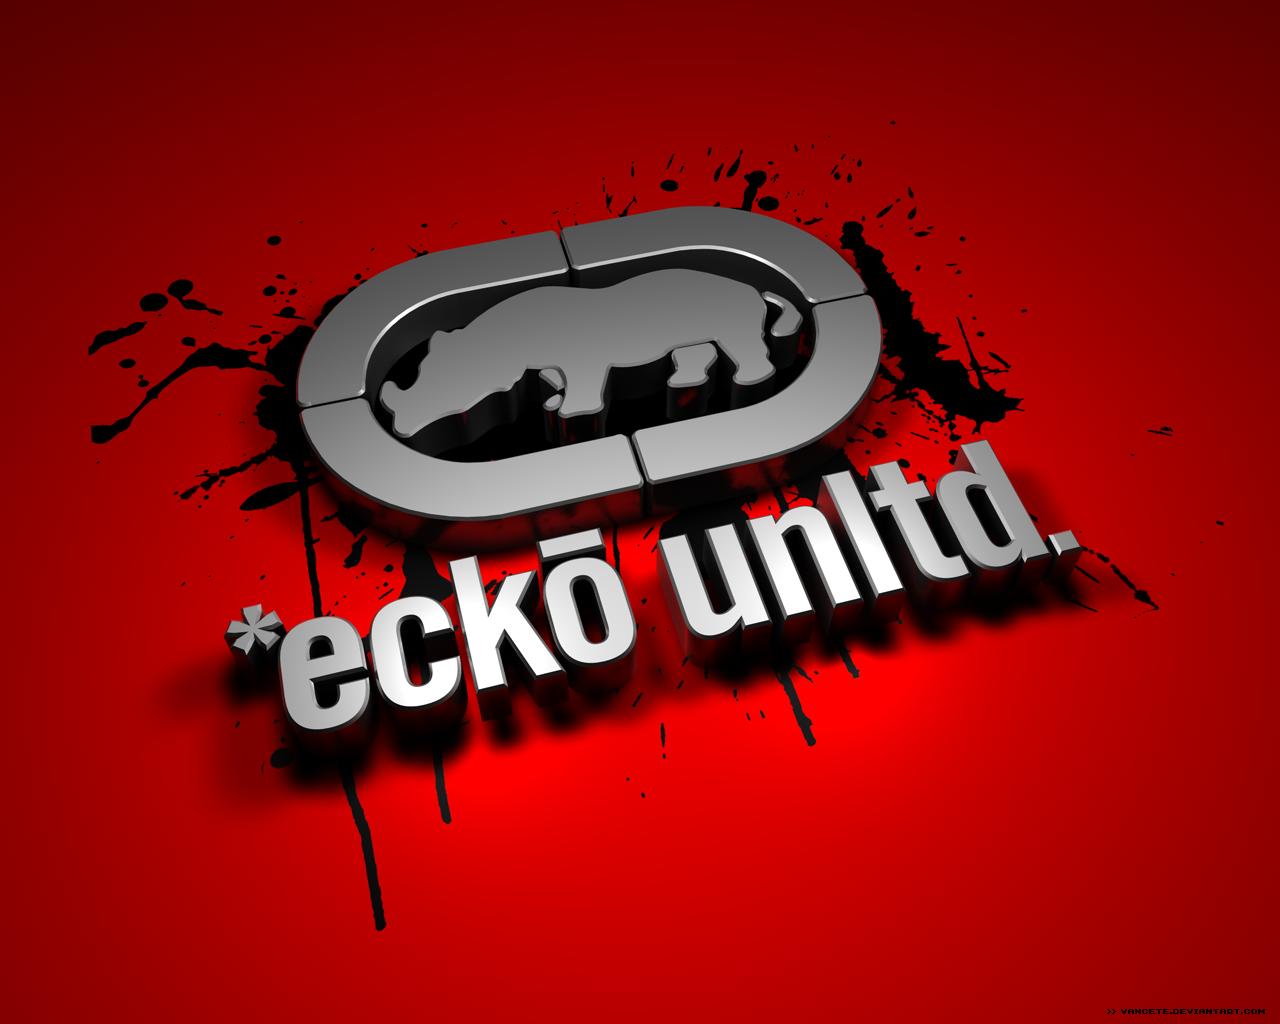 Red Ecko Unltd Wallpaper by Vancete 1280x1024